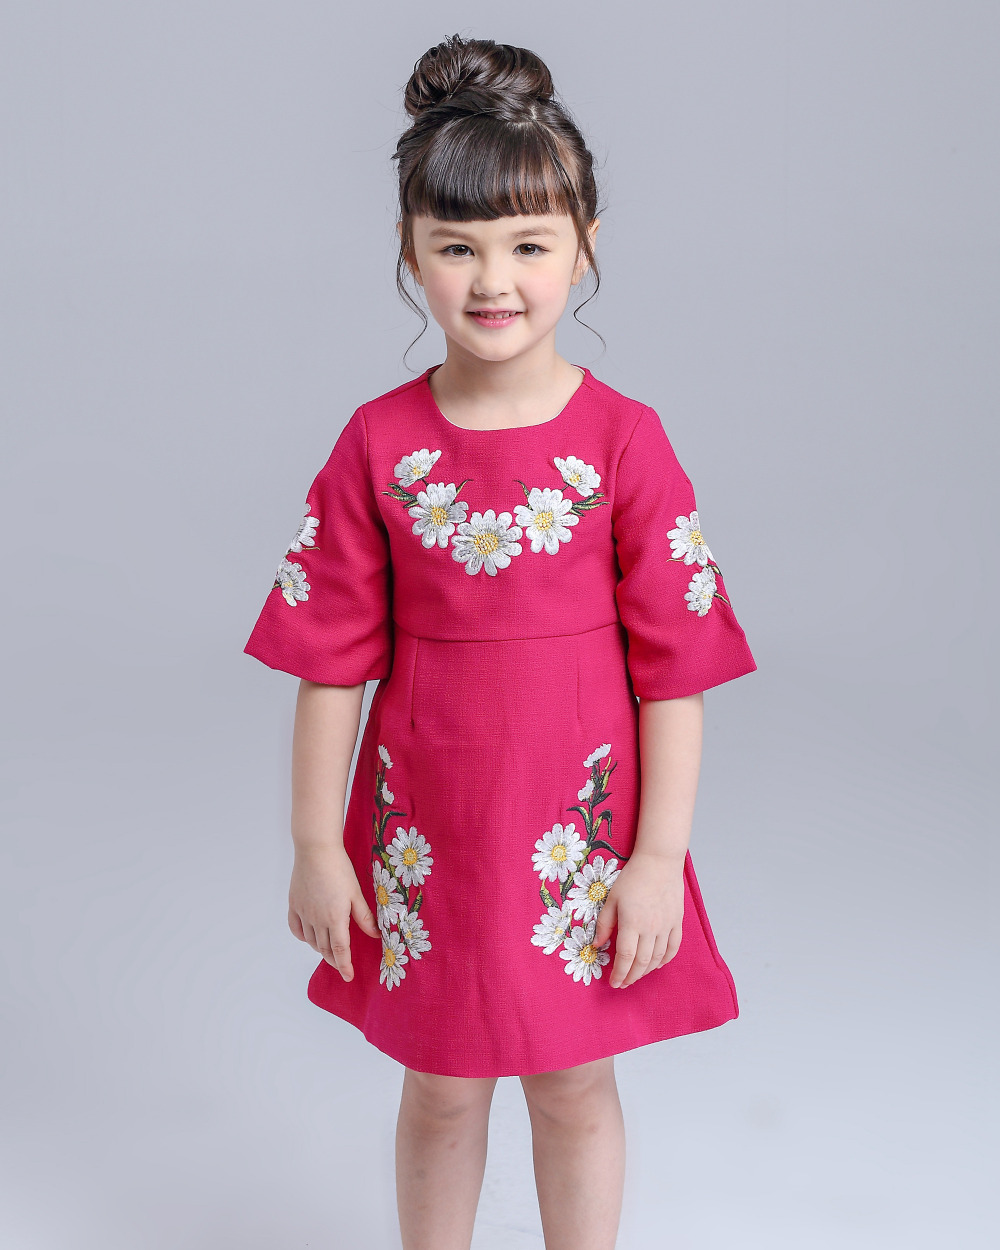 ツ)_/¯Nueva Niñas vestido princesa traje 2016 marca niños vestido ...